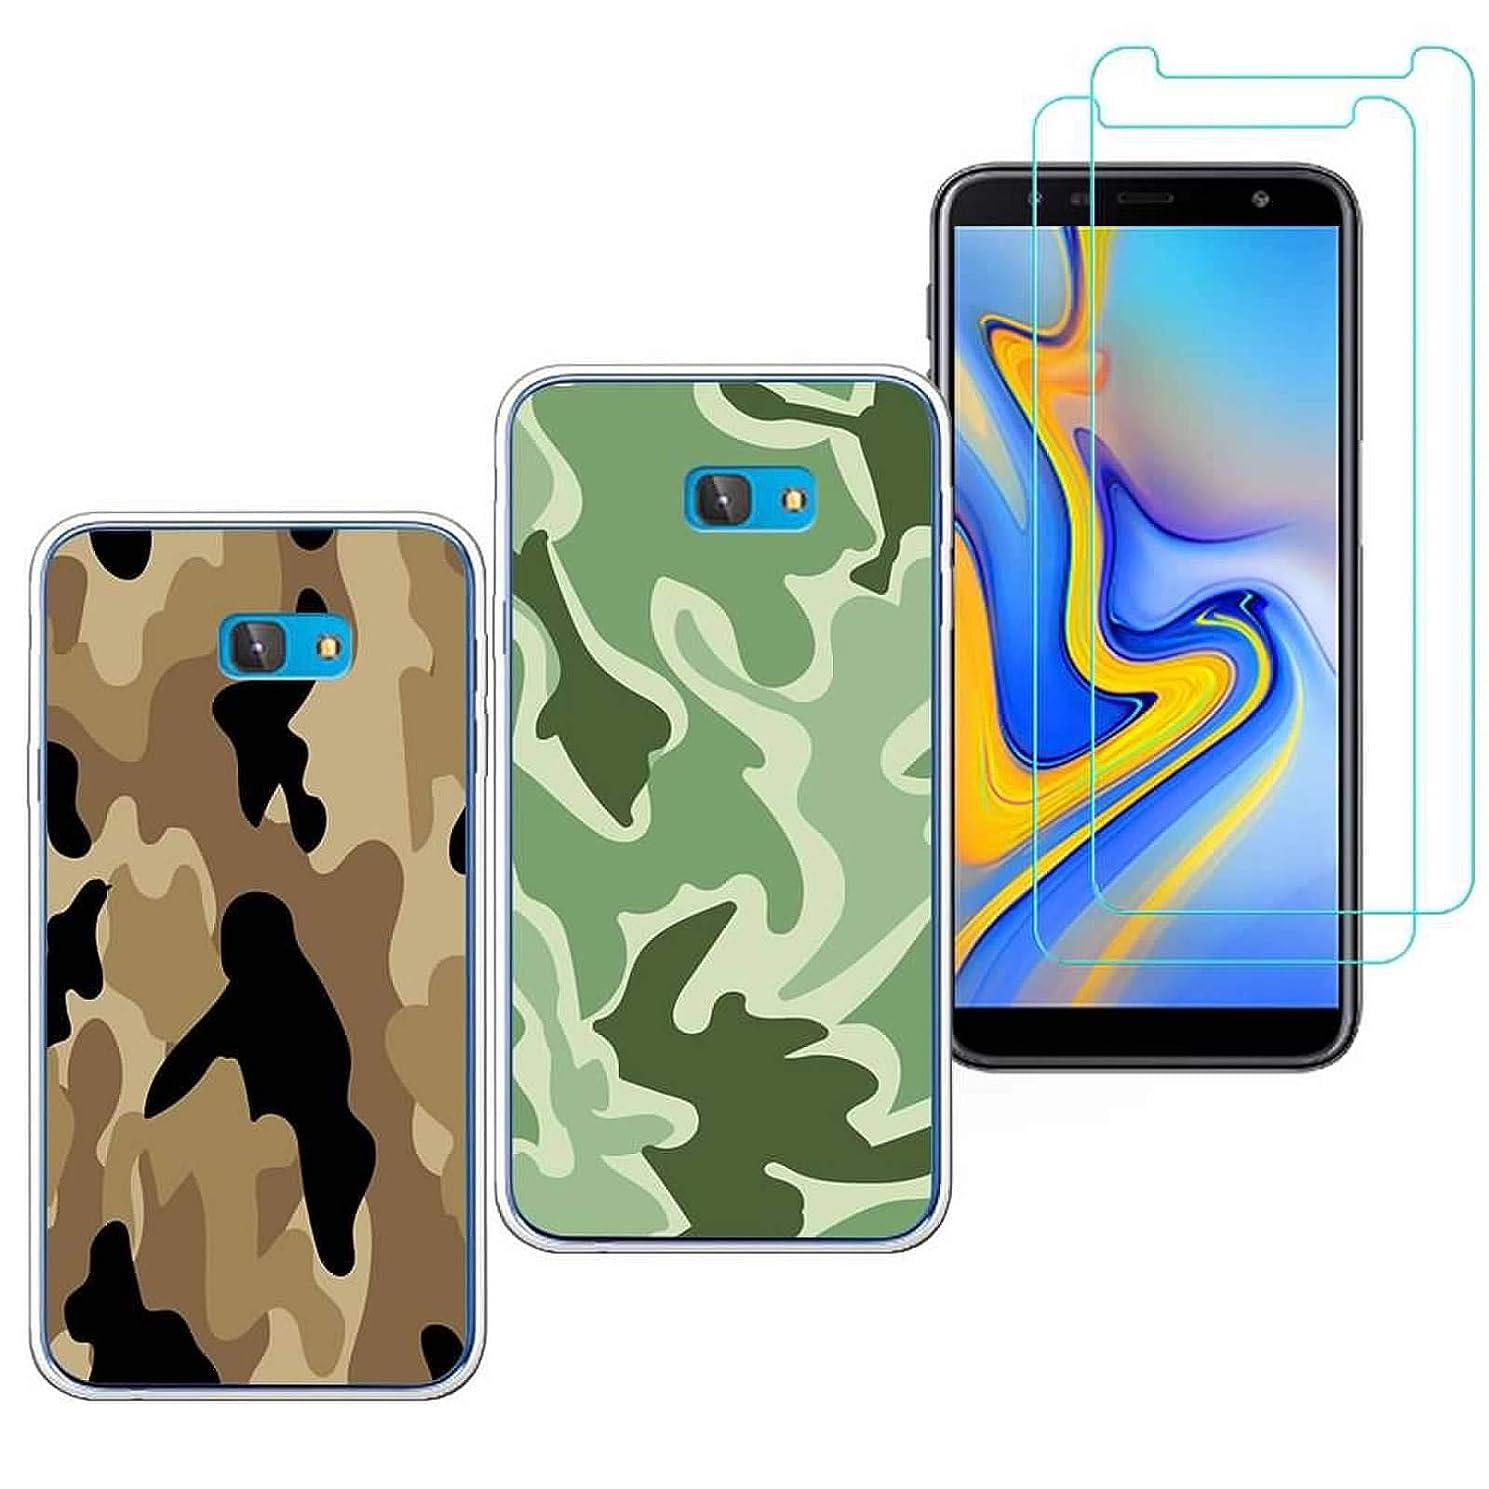 2 X Samsung Galaxy J7 / J7 Prime Case with 2 Pack Glass Screen Protector Phone Case Clear Soft TPU with Protective Bumper Cover Case for Samsung Galaxy J7 Sky Pro Case / J7 Perx (2017)